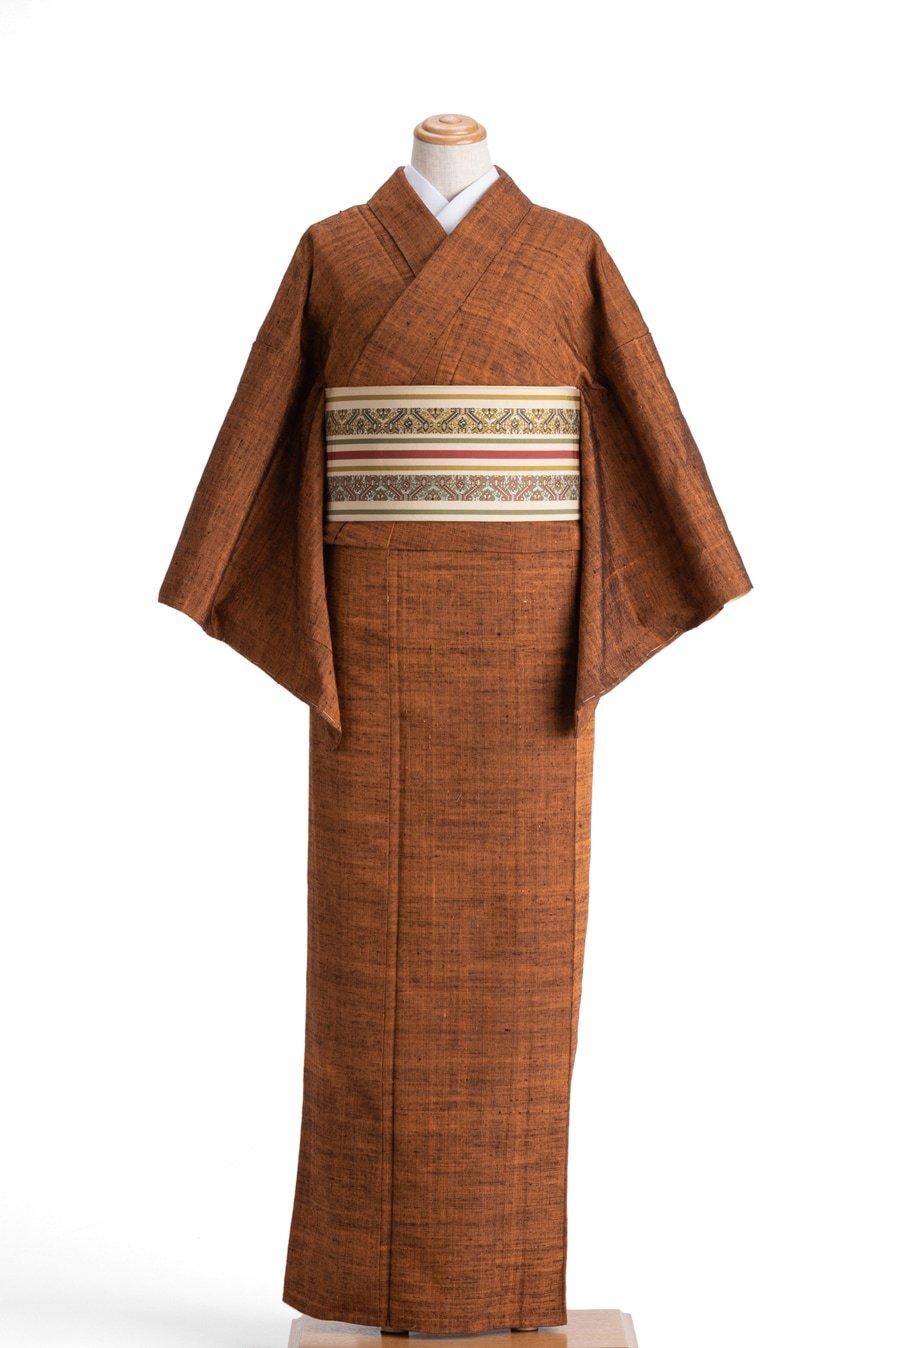 「単衣 紬 茶柿色」の商品画像